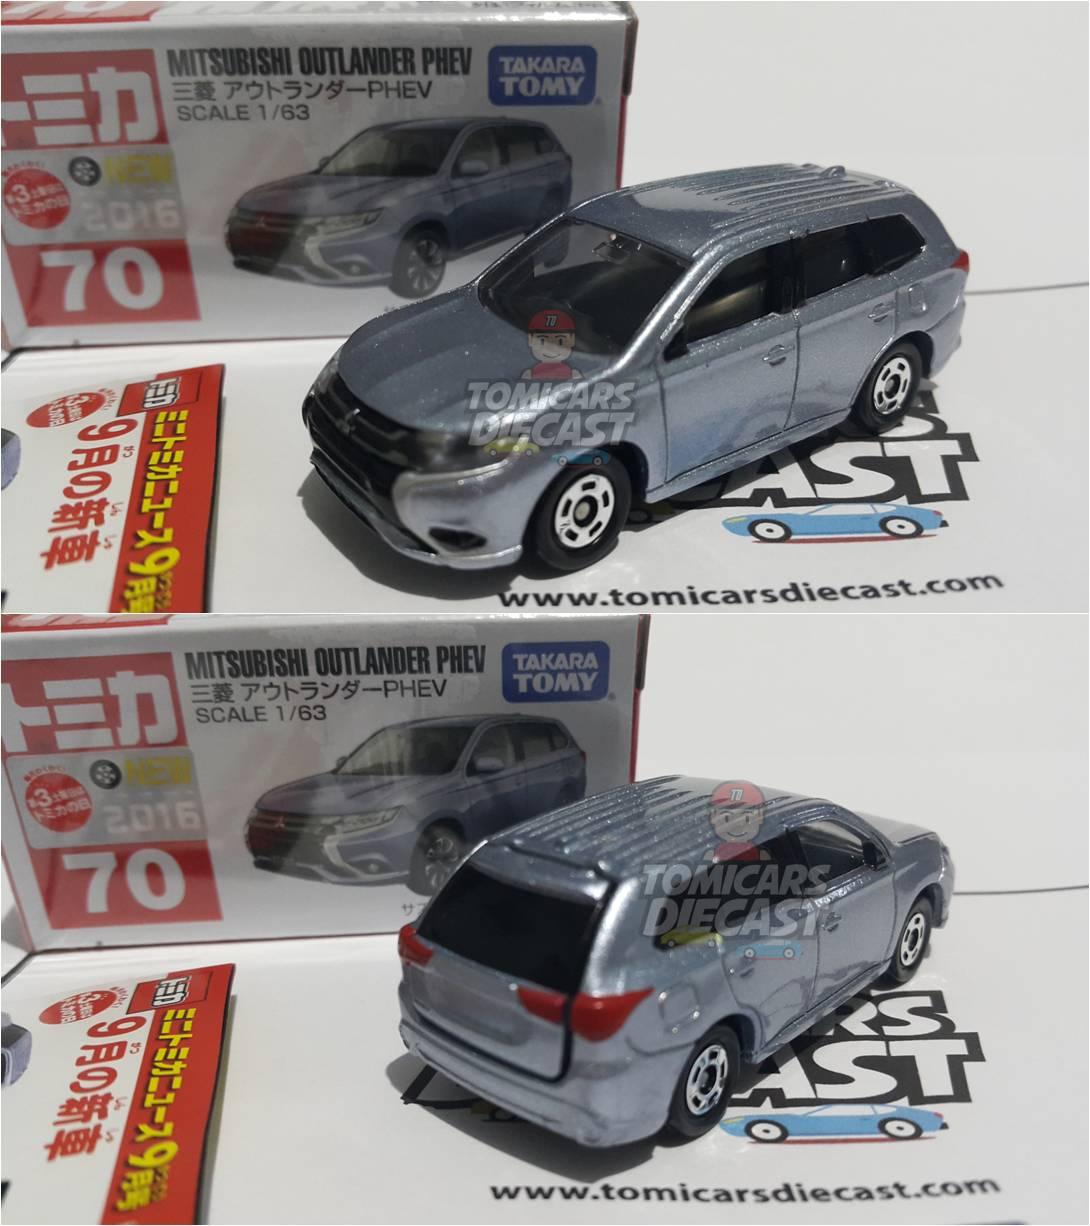 Mitsubishi Outlander Phev Silver Tomicars Diecast Shop